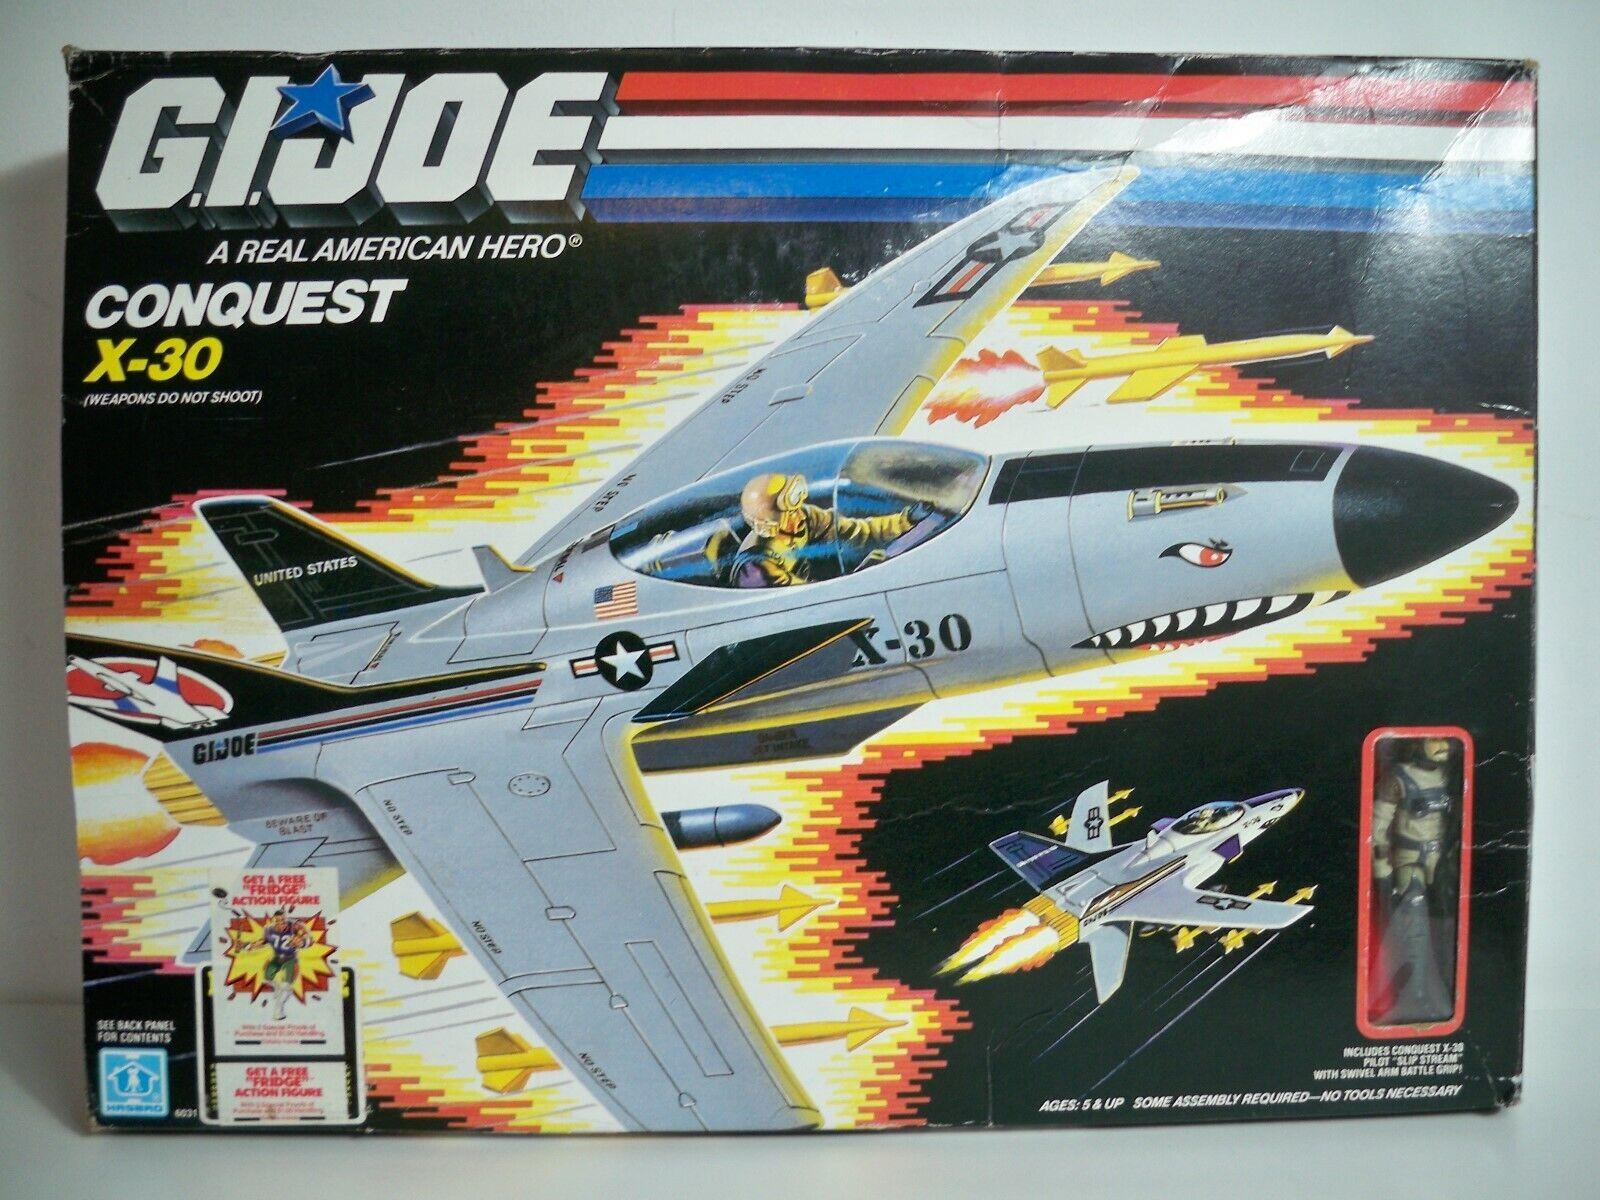 K1905612 CONQUEST X-30 MIB MINT IN BOX SEALED 100% COMPLETE 1986 GI JOE VINTAGE